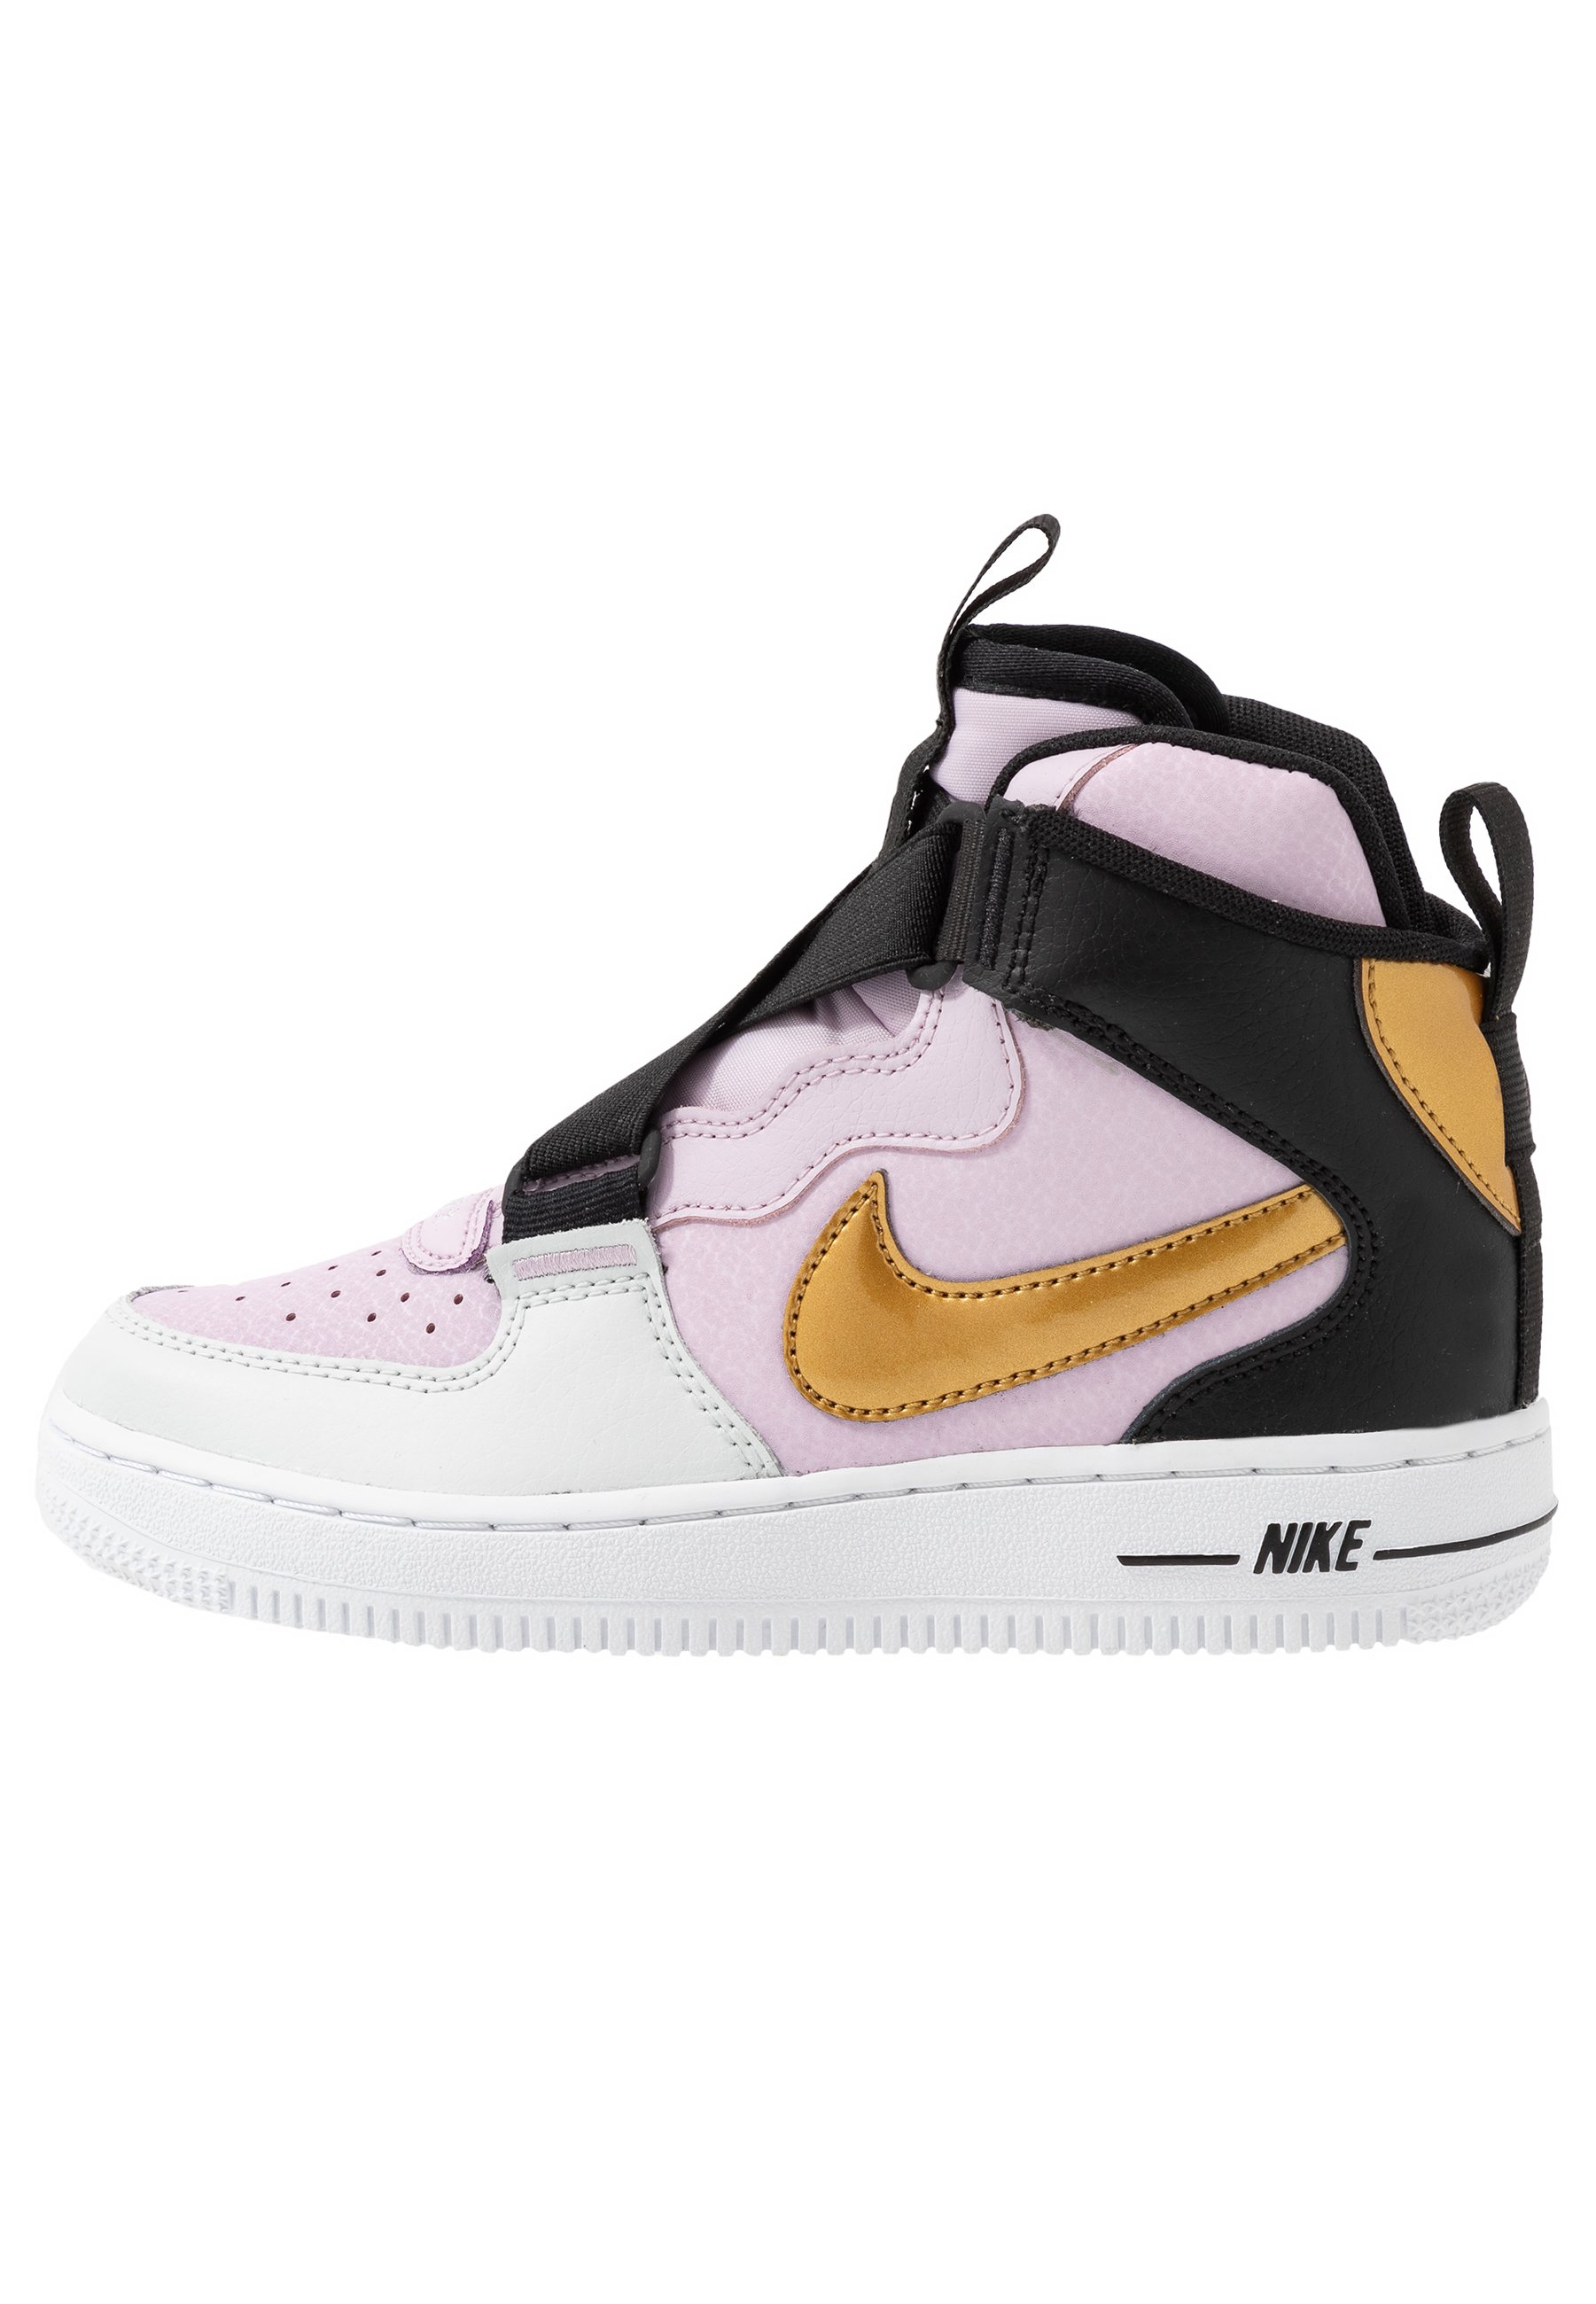 nike enfant chaussure montante